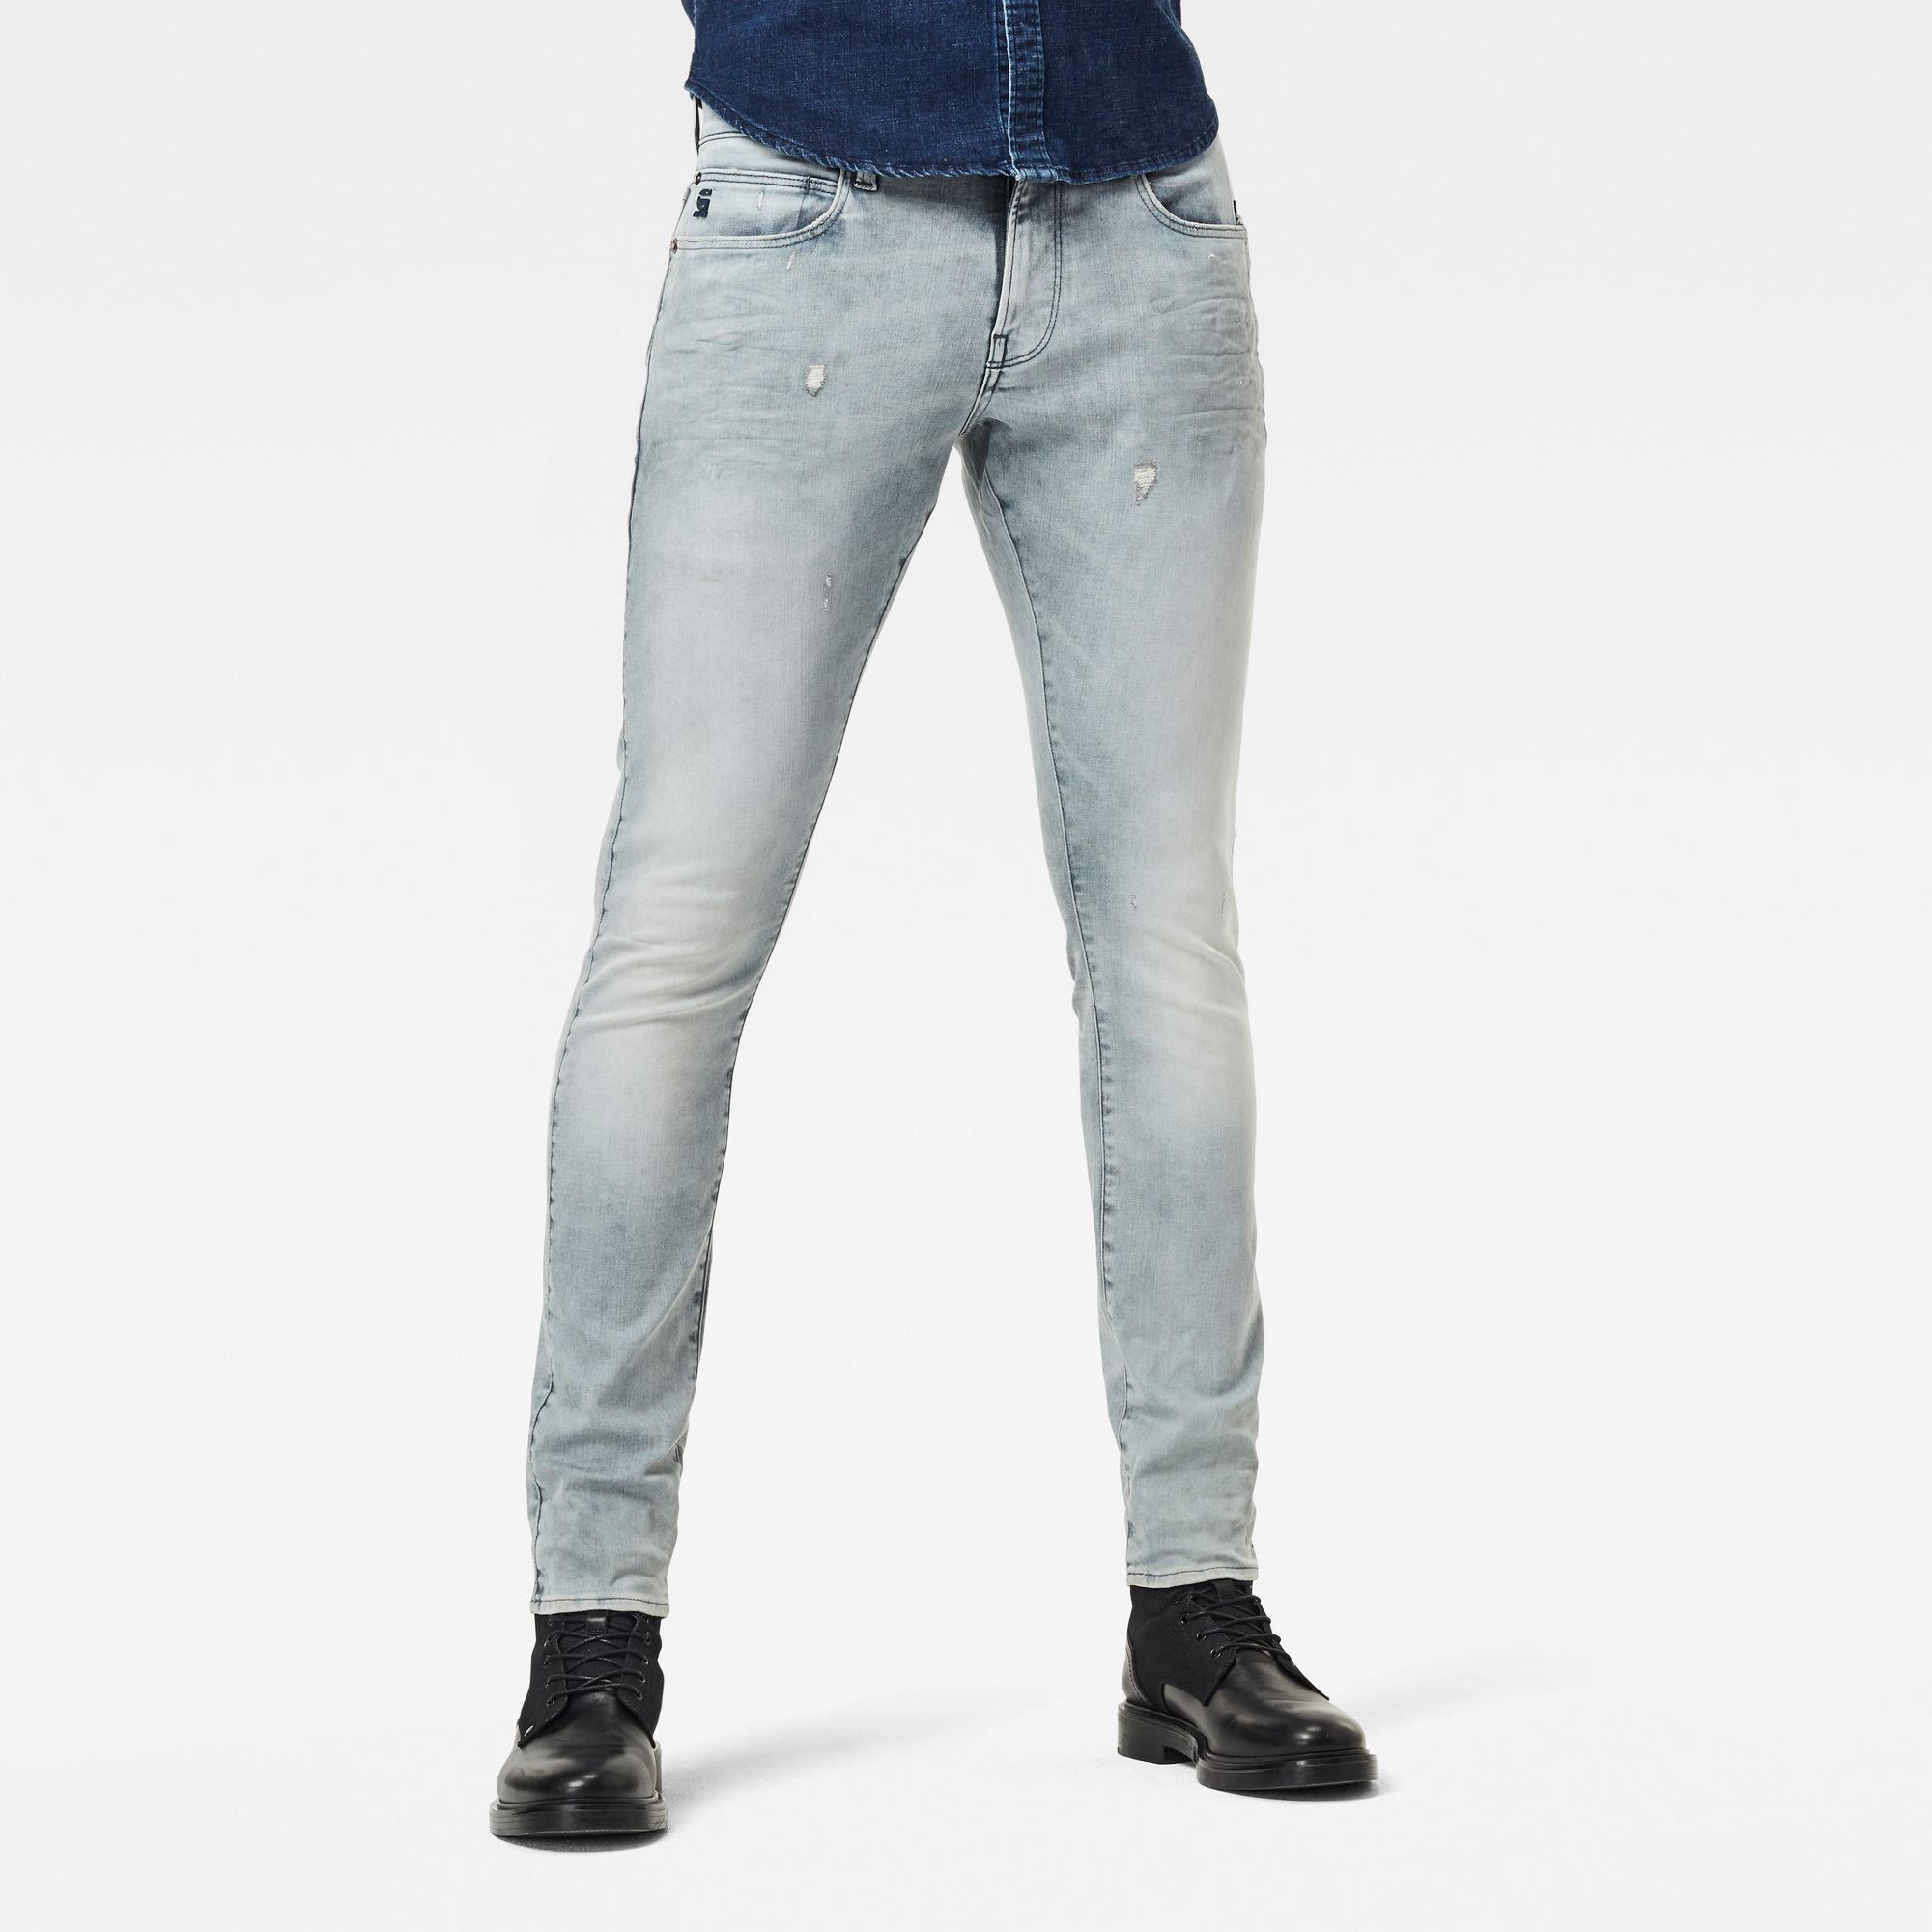 G-Star RAW Heren Lancet Skinny Jeans Grijs